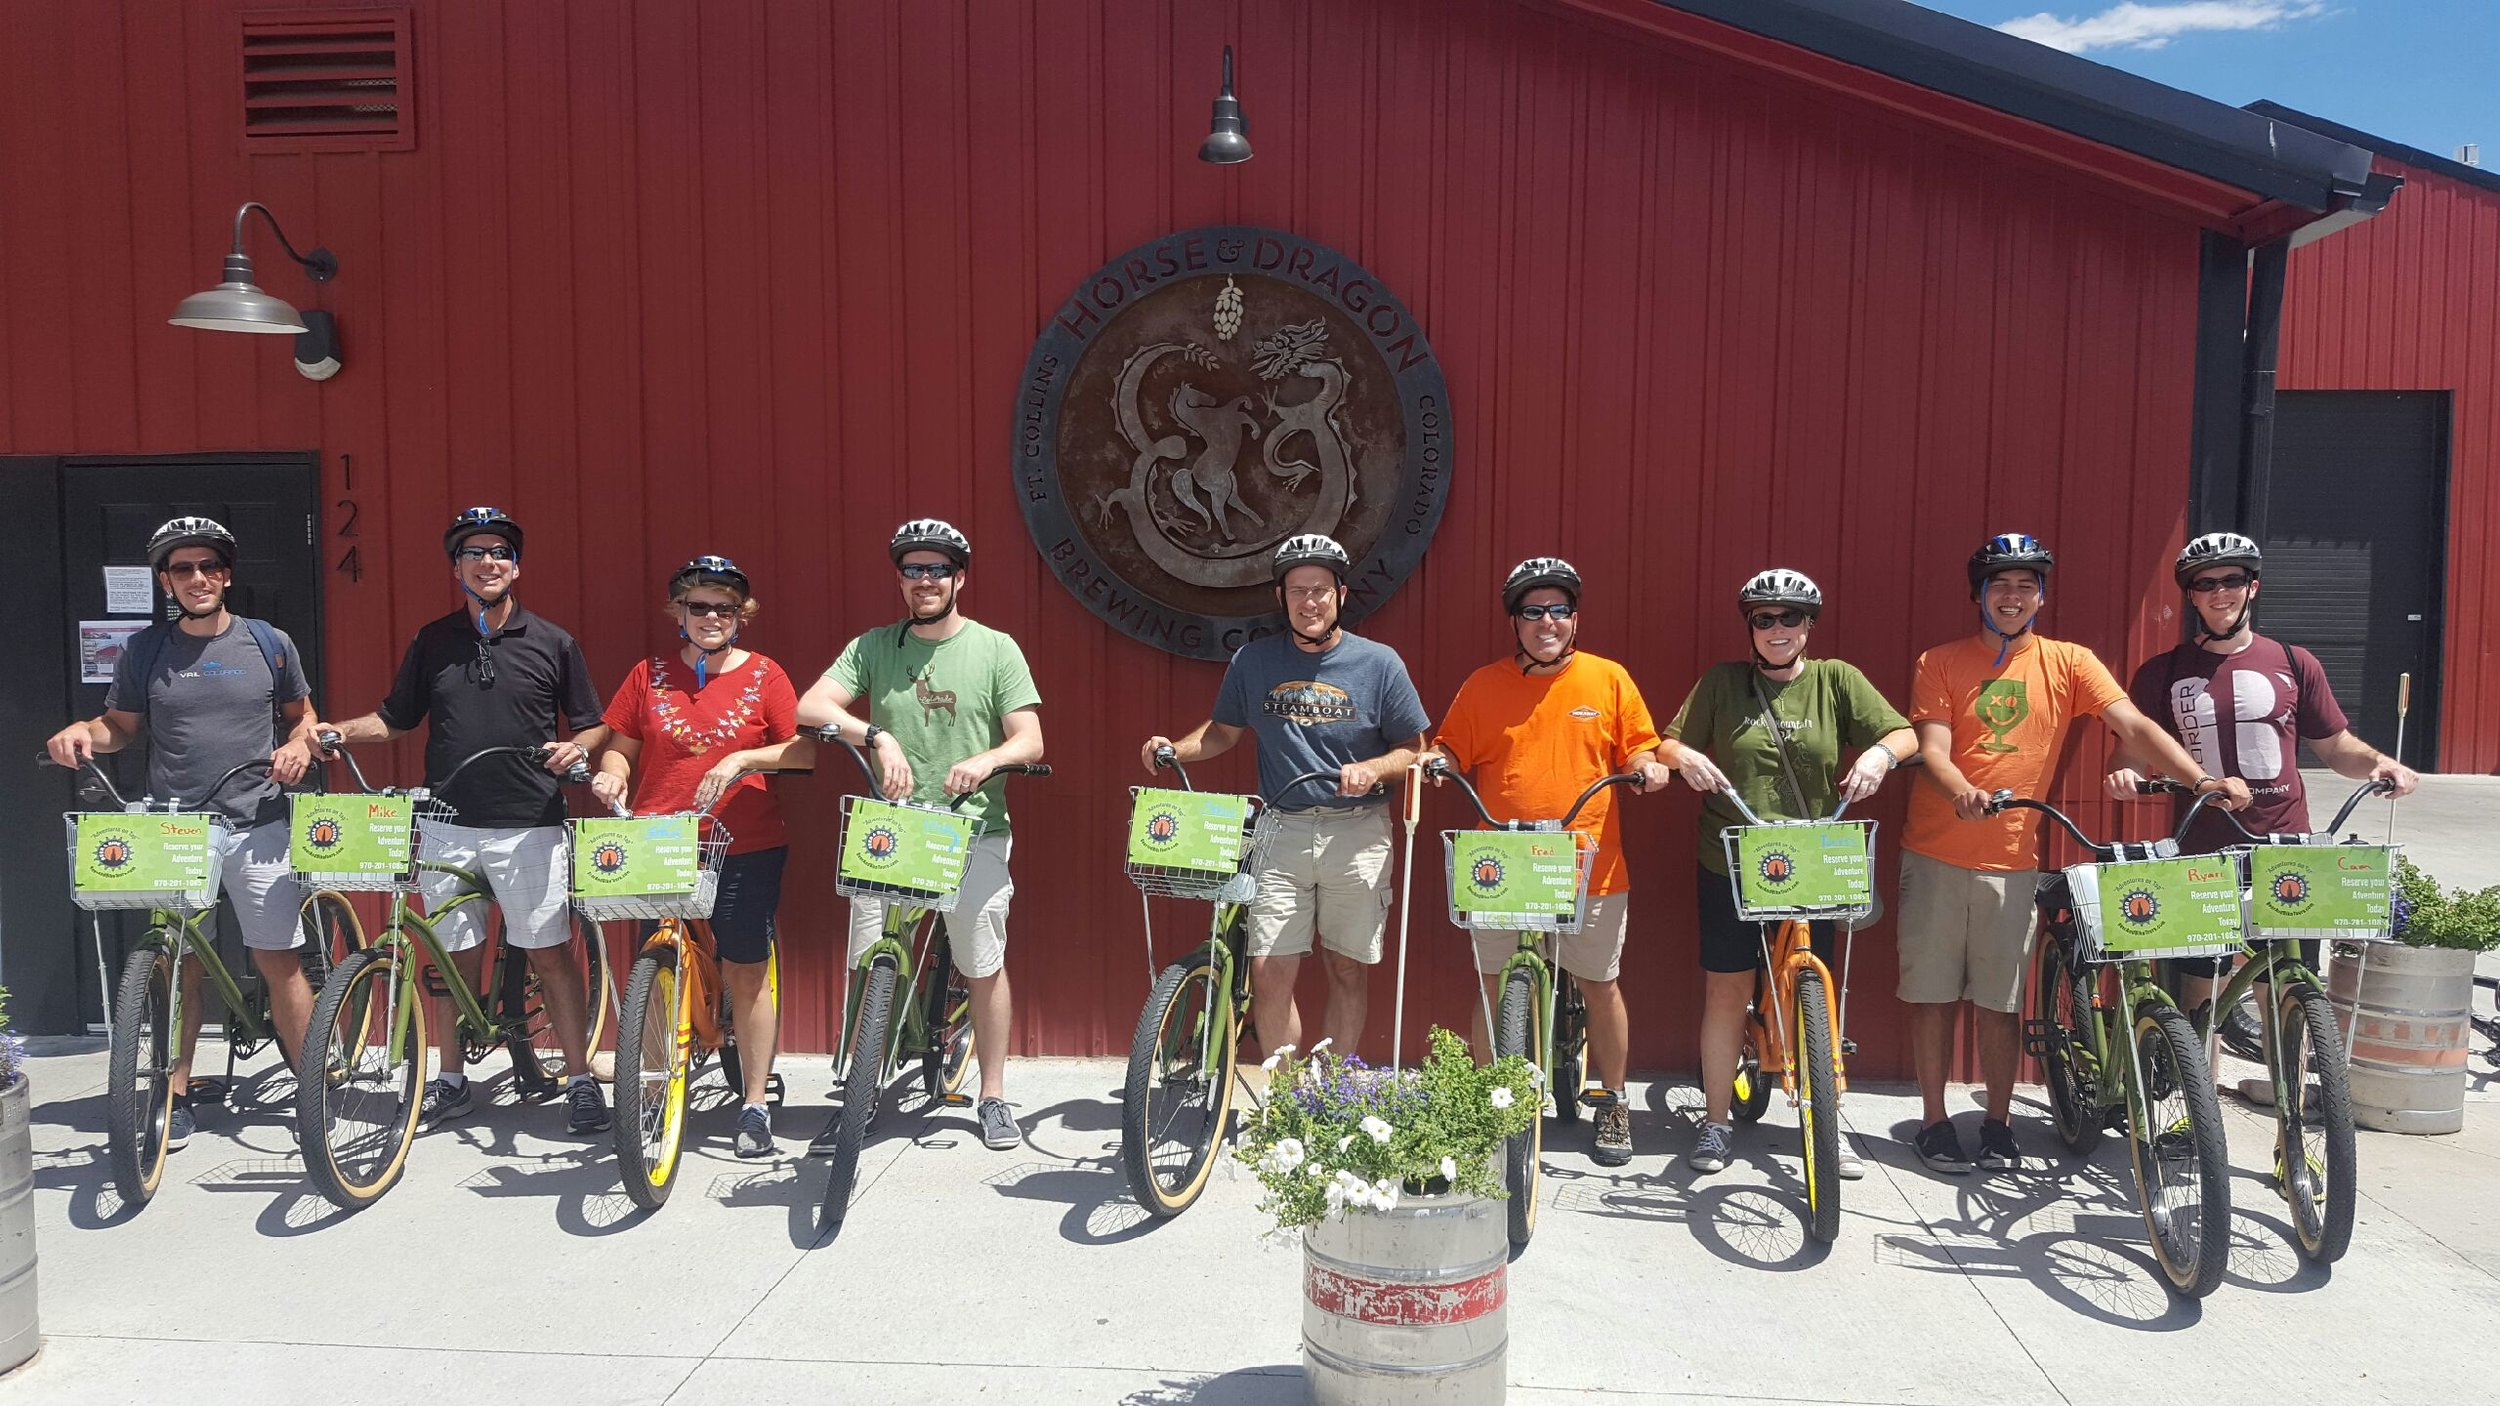 Fun Group visiting Horse & Dragon Brewing